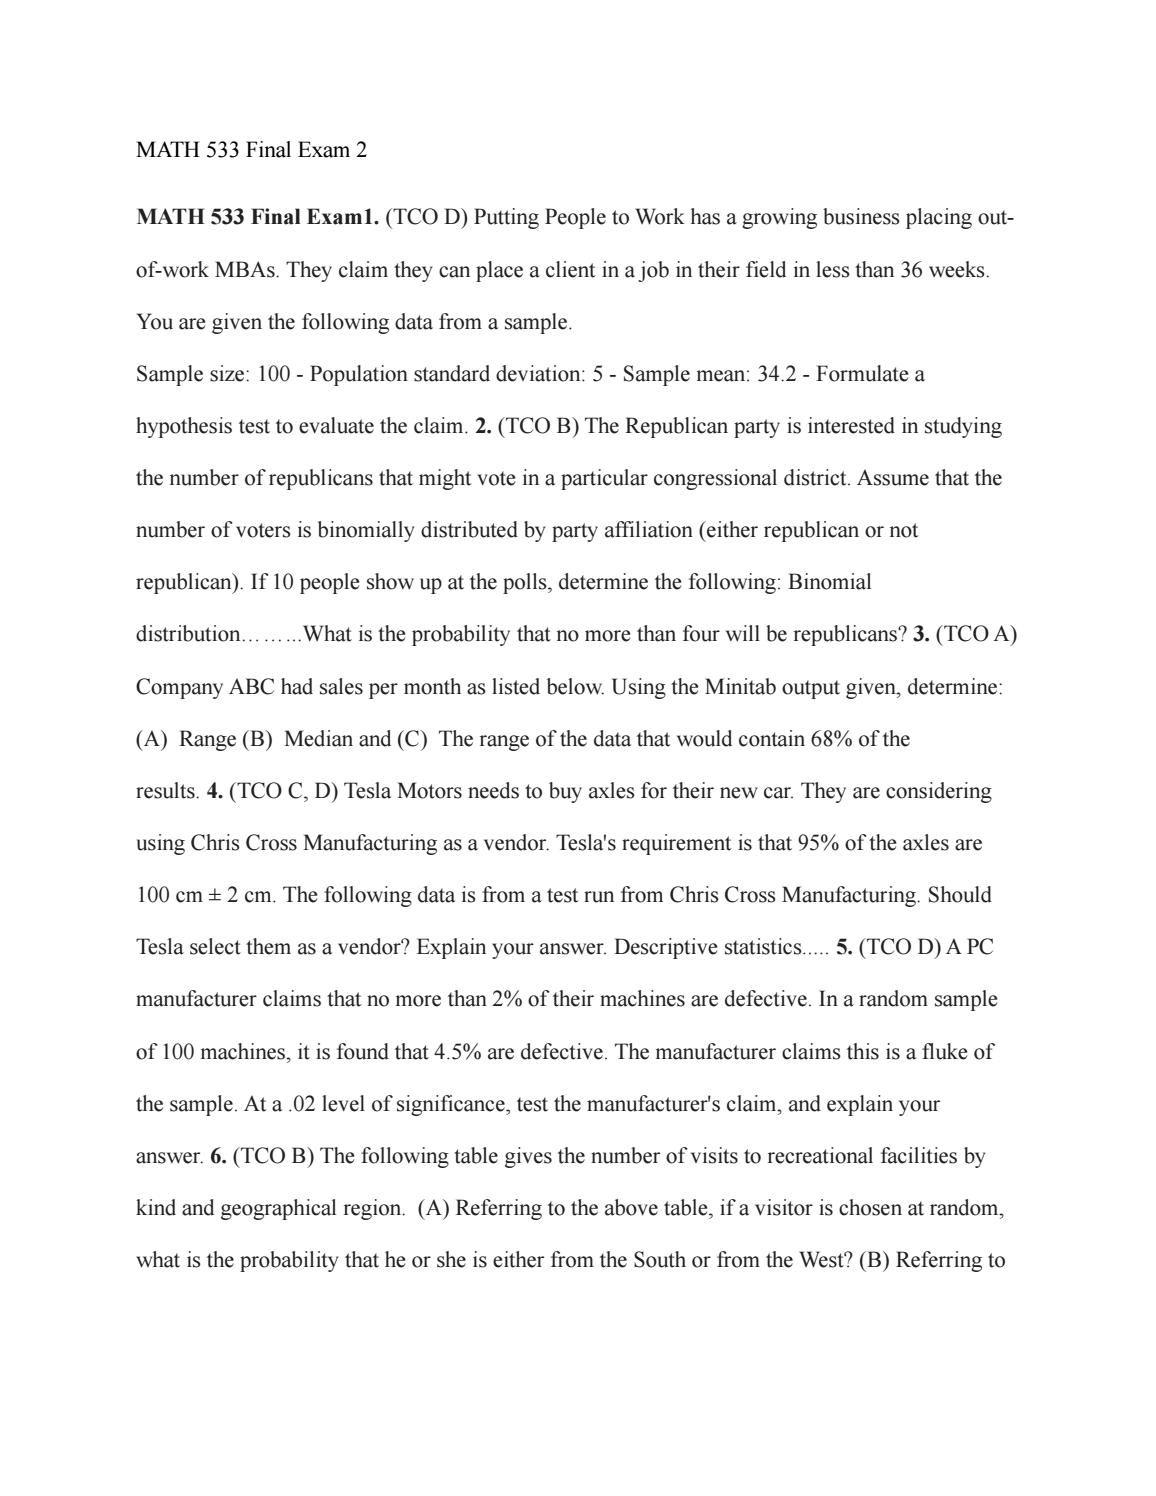 Math 533 Final Exam 2 Solved Best Price Philosophy Essay Moral Format